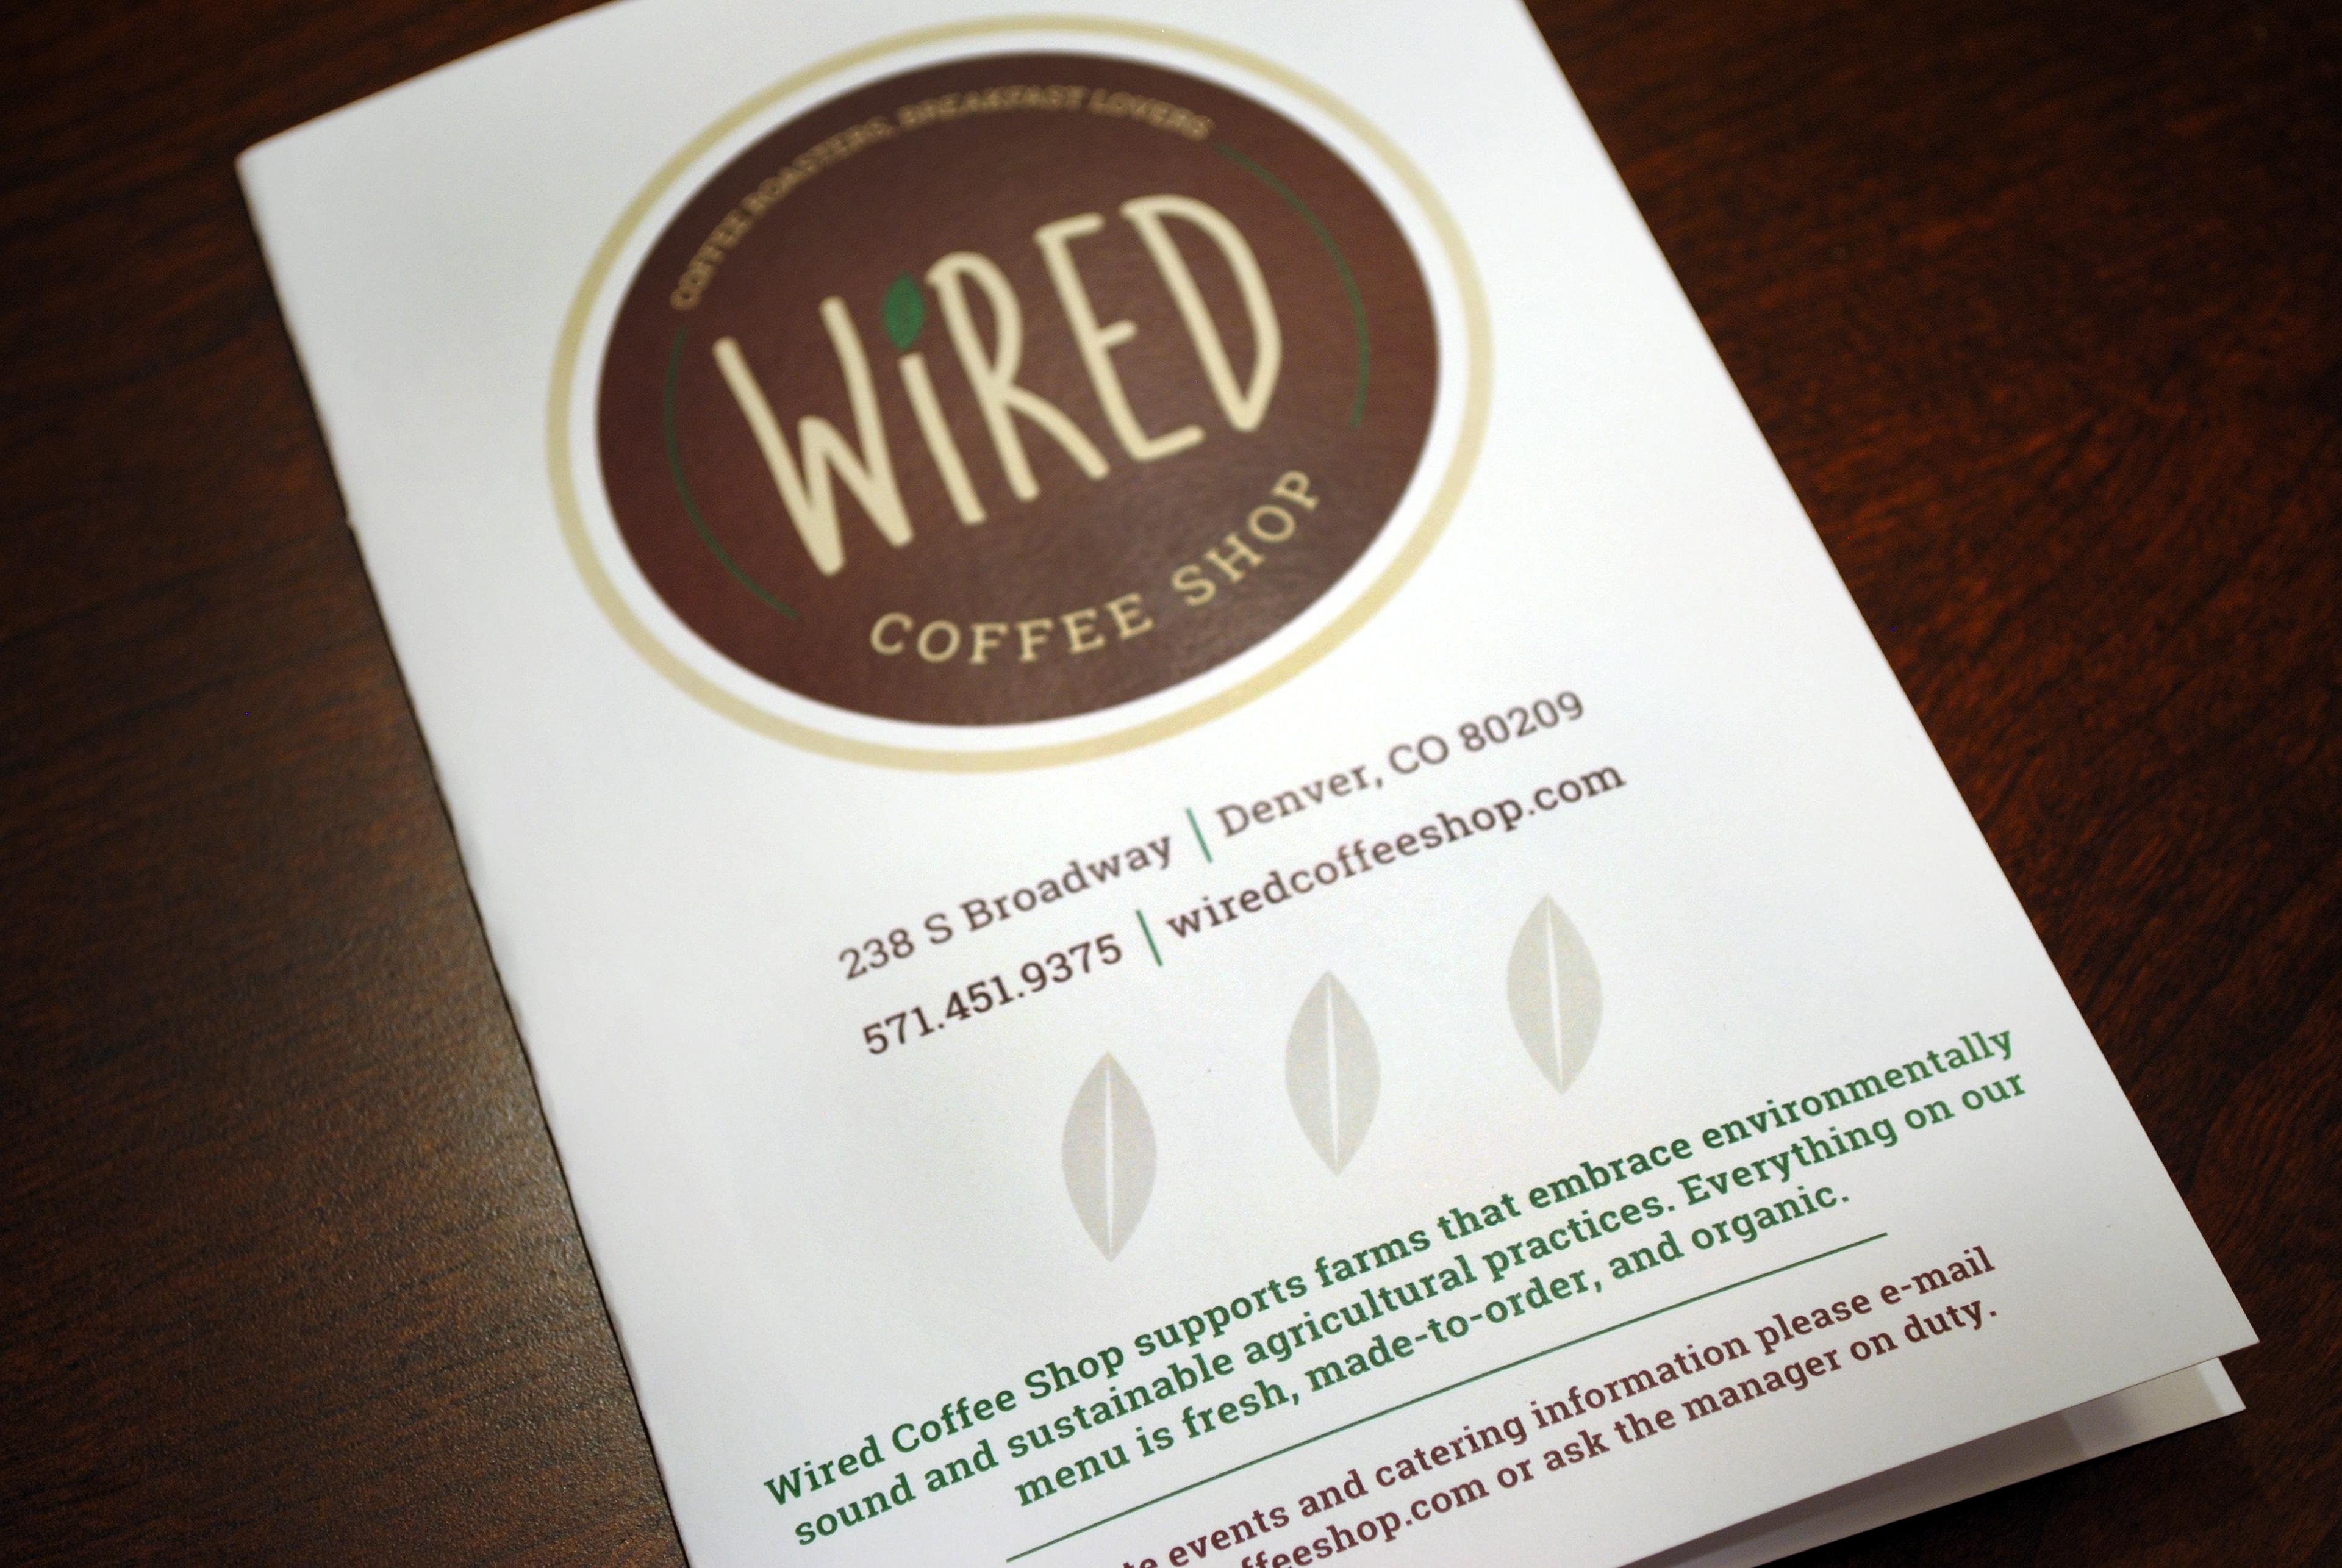 Reem Garada - Wired Coffee Shop